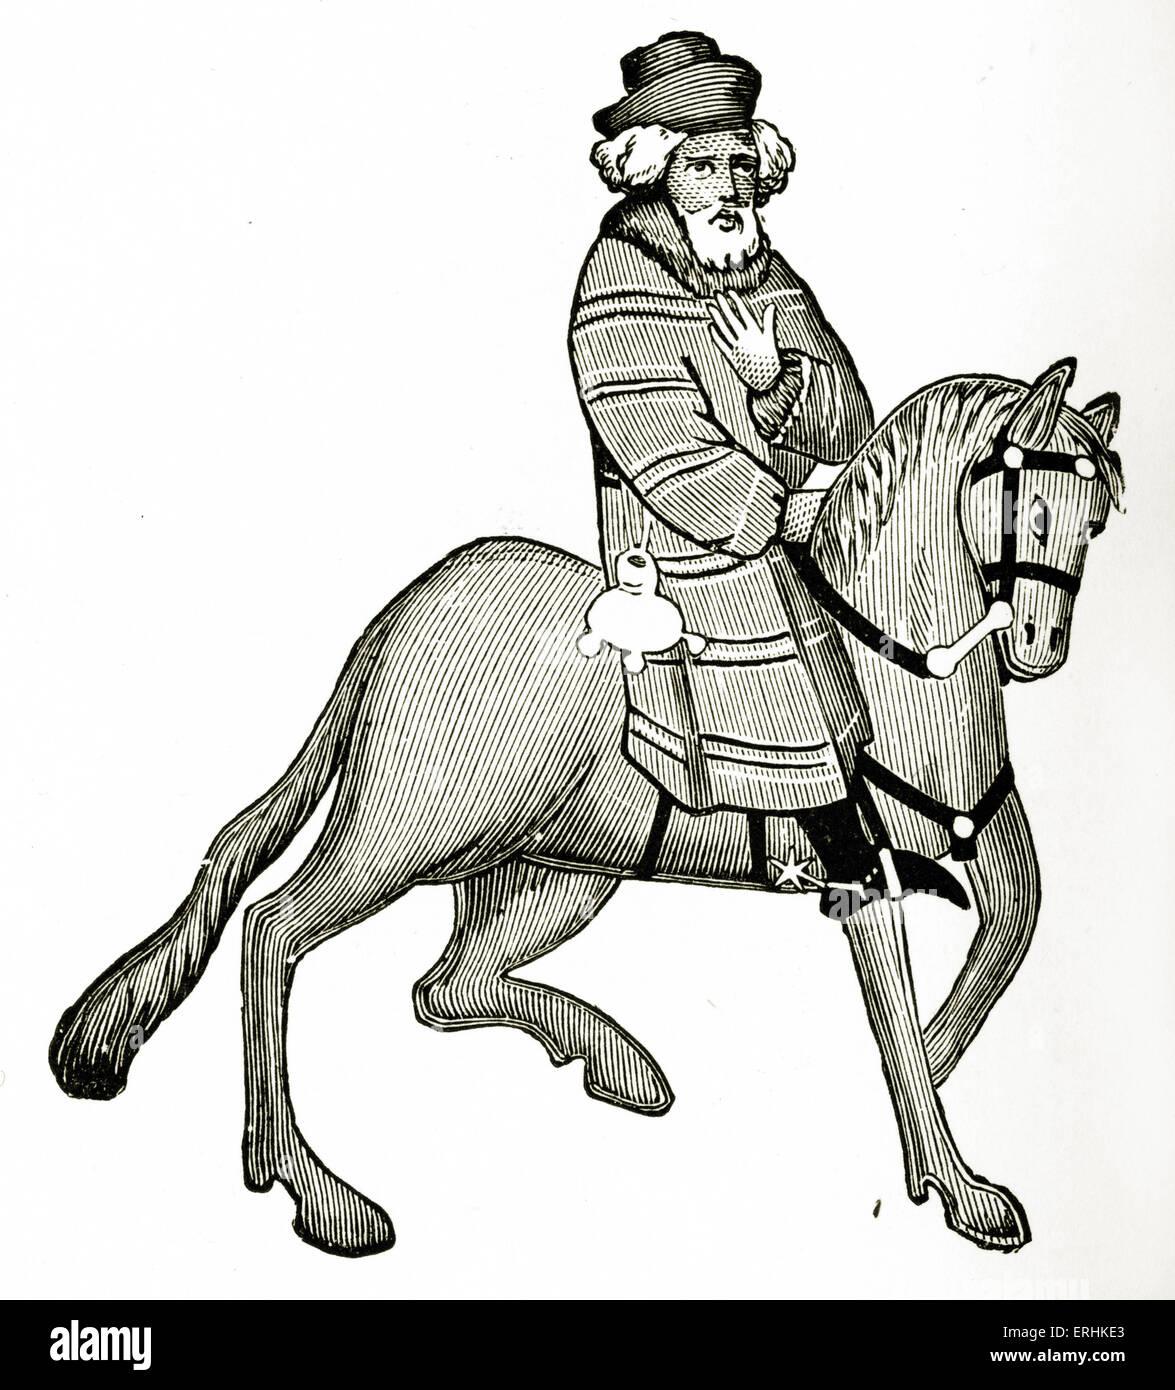 Geoffrey Chaucer ' s Canterbury Tales - The Franklin  on horseback.  English poet, c. 1343-1400. Ellesmere manuscript - Stock Image